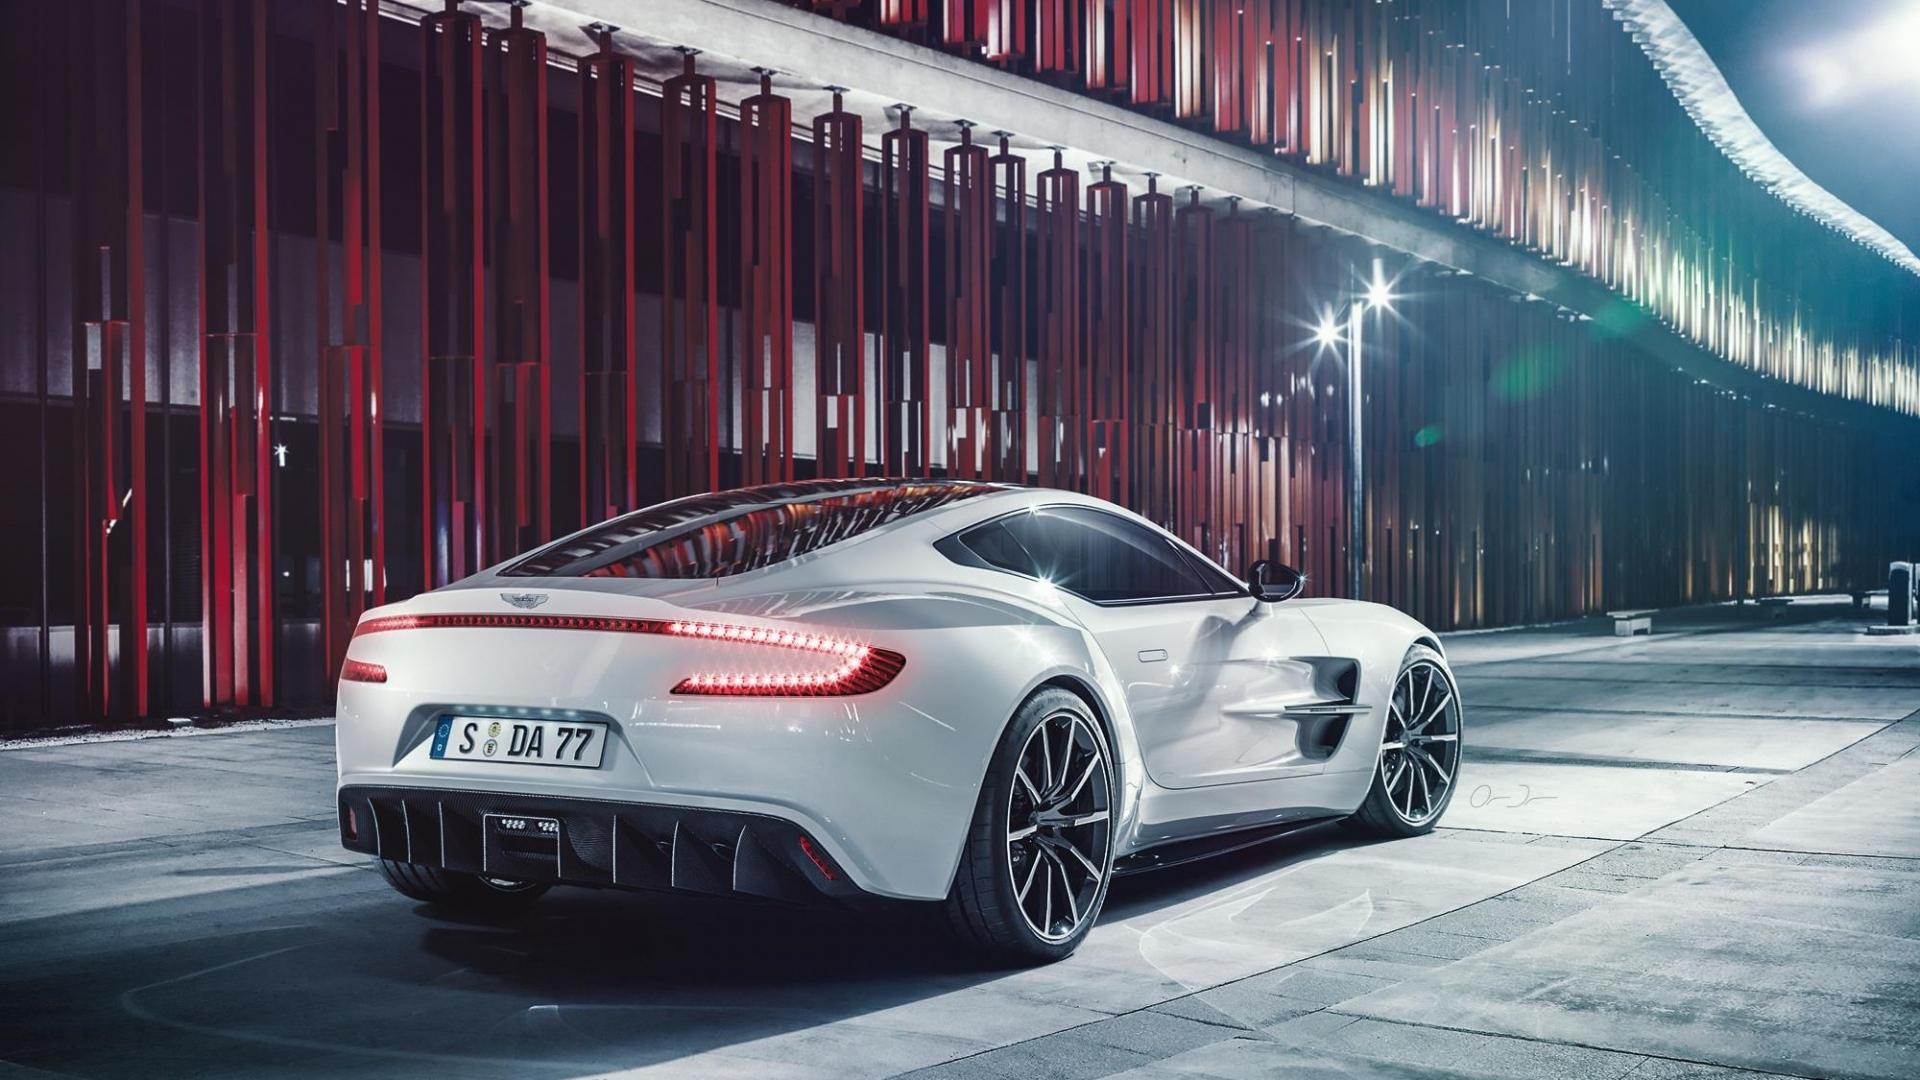 Download-Free-Aston-Martin-One-77-Wallpaper-04